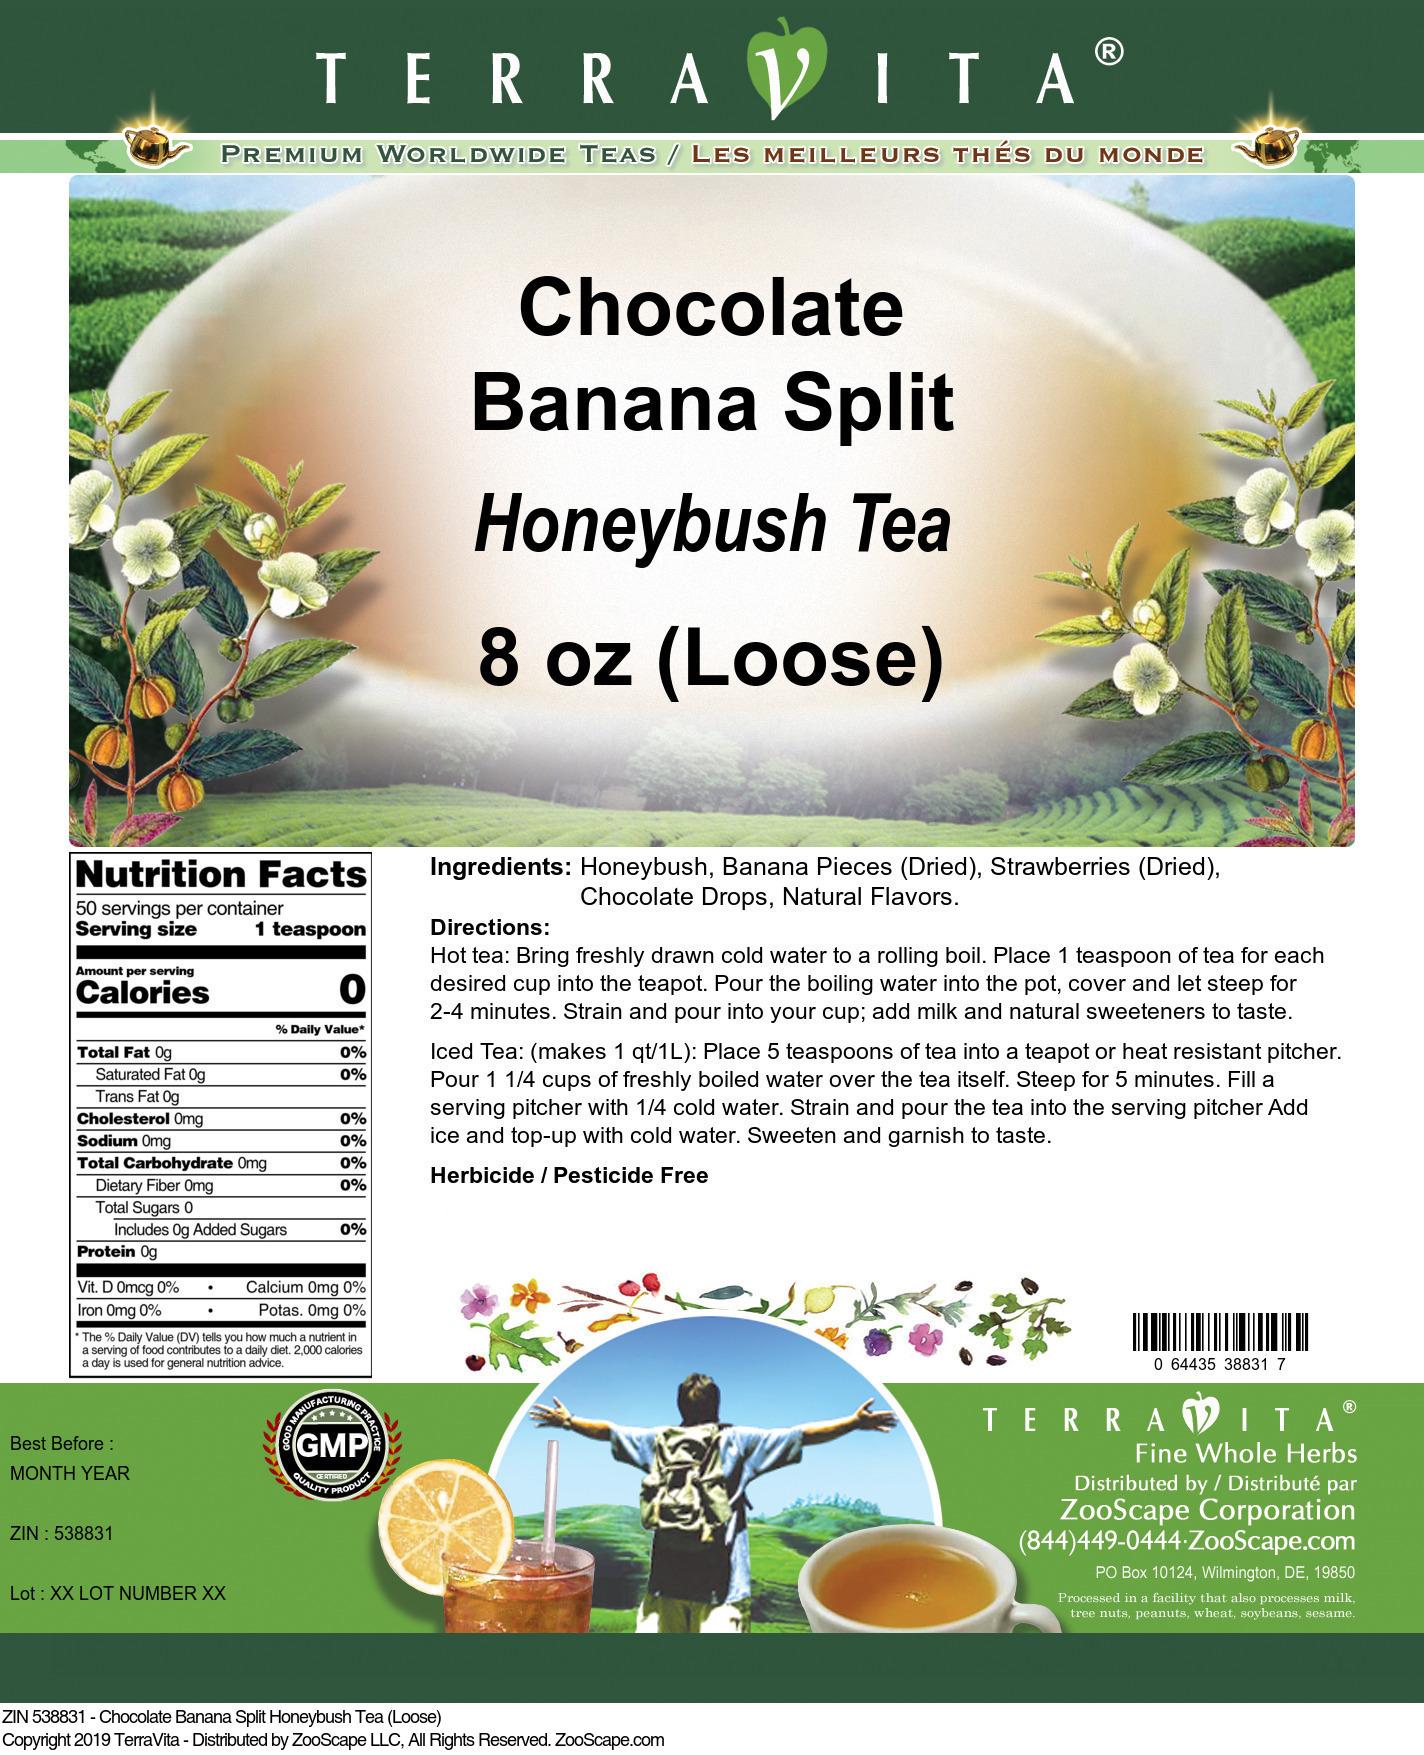 Chocolate Banana Split Honeybush Tea